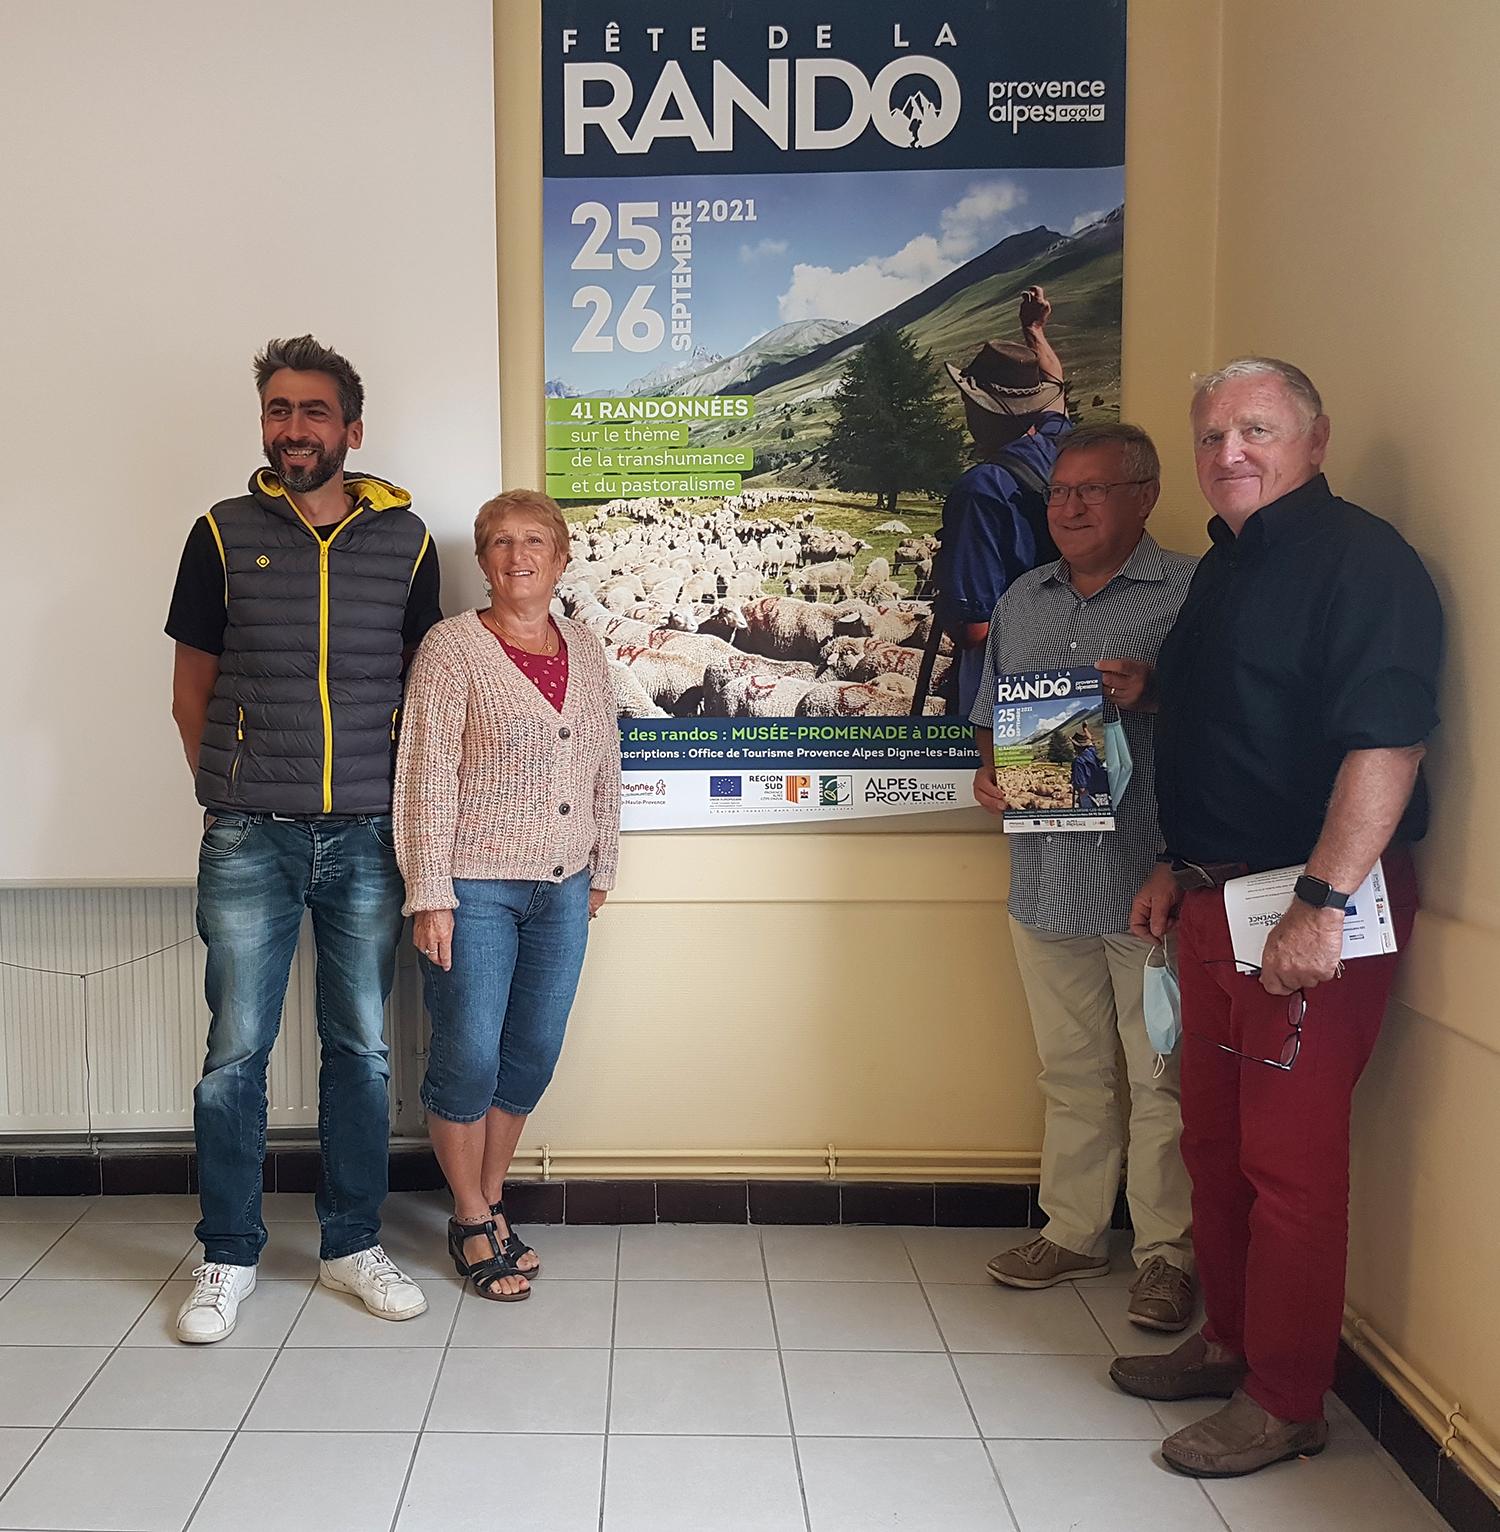 Mathieu Vincent, Aline et Jean-Marie Danthez, et Bernard Teyssier